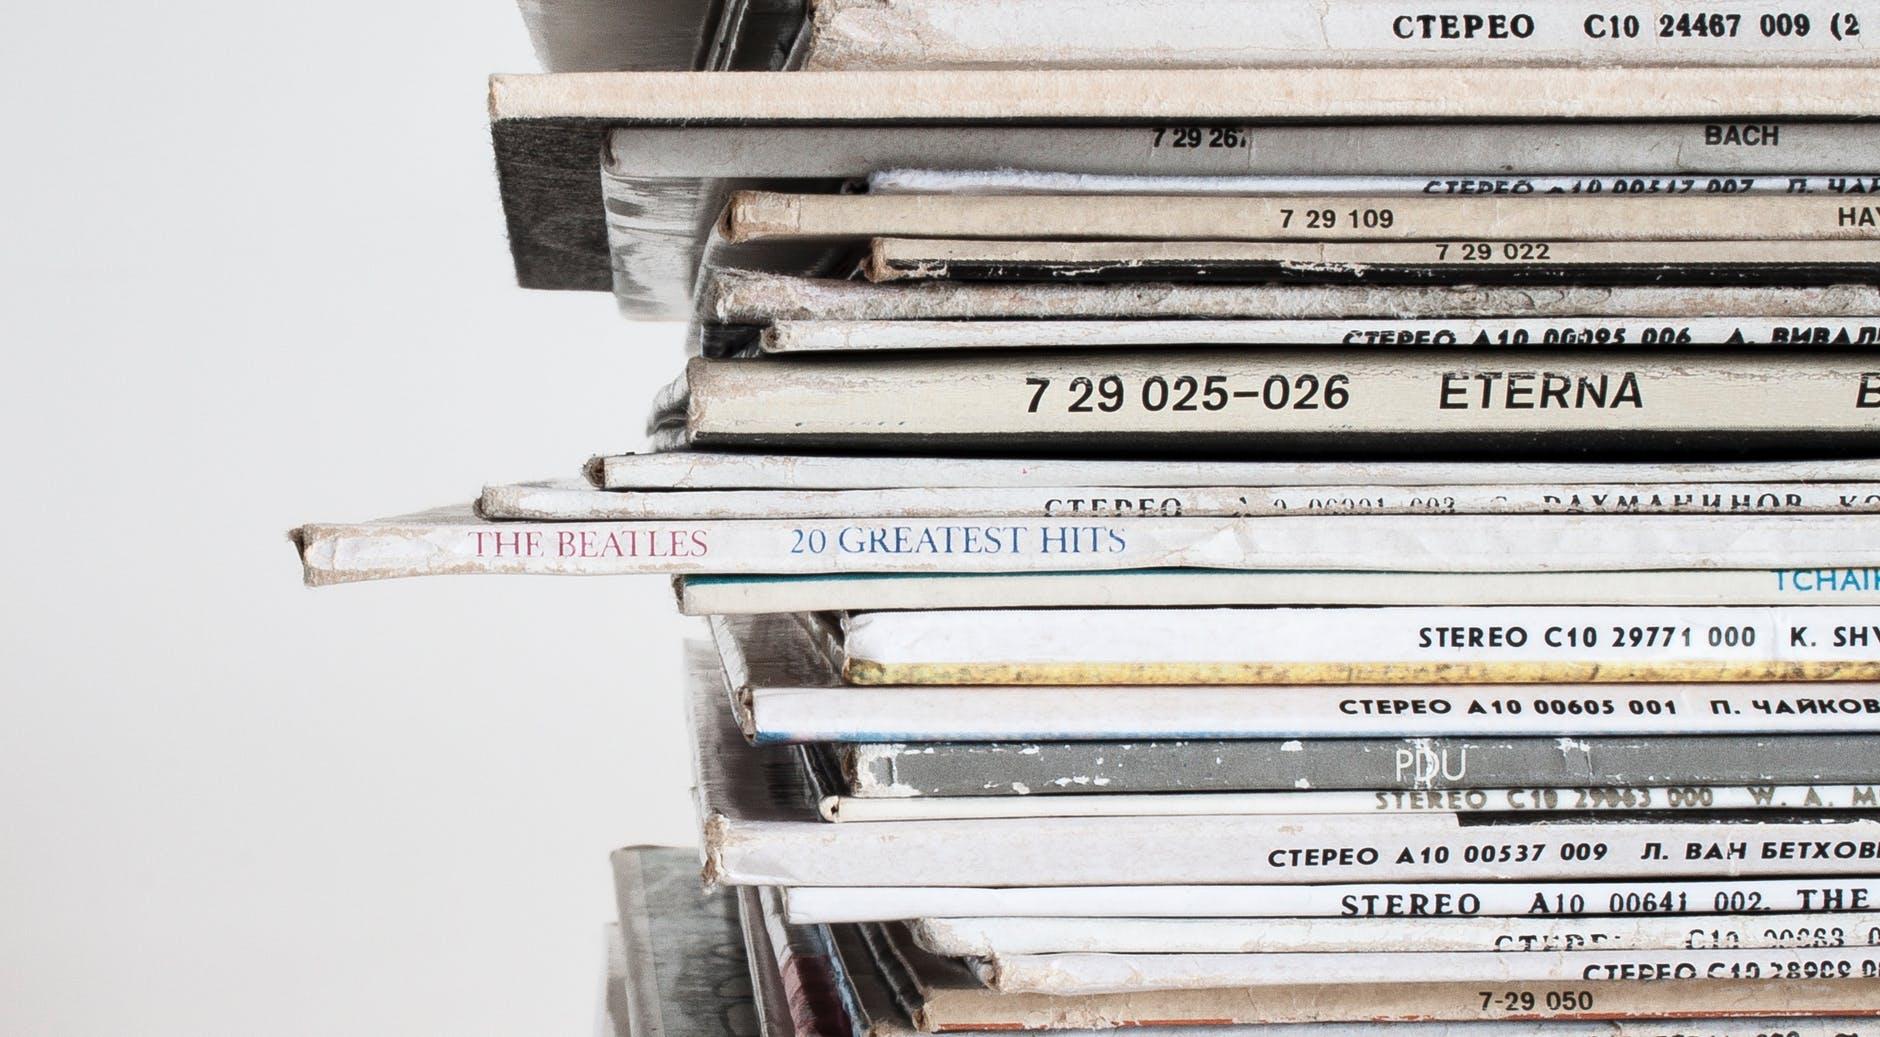 albums.jpeg